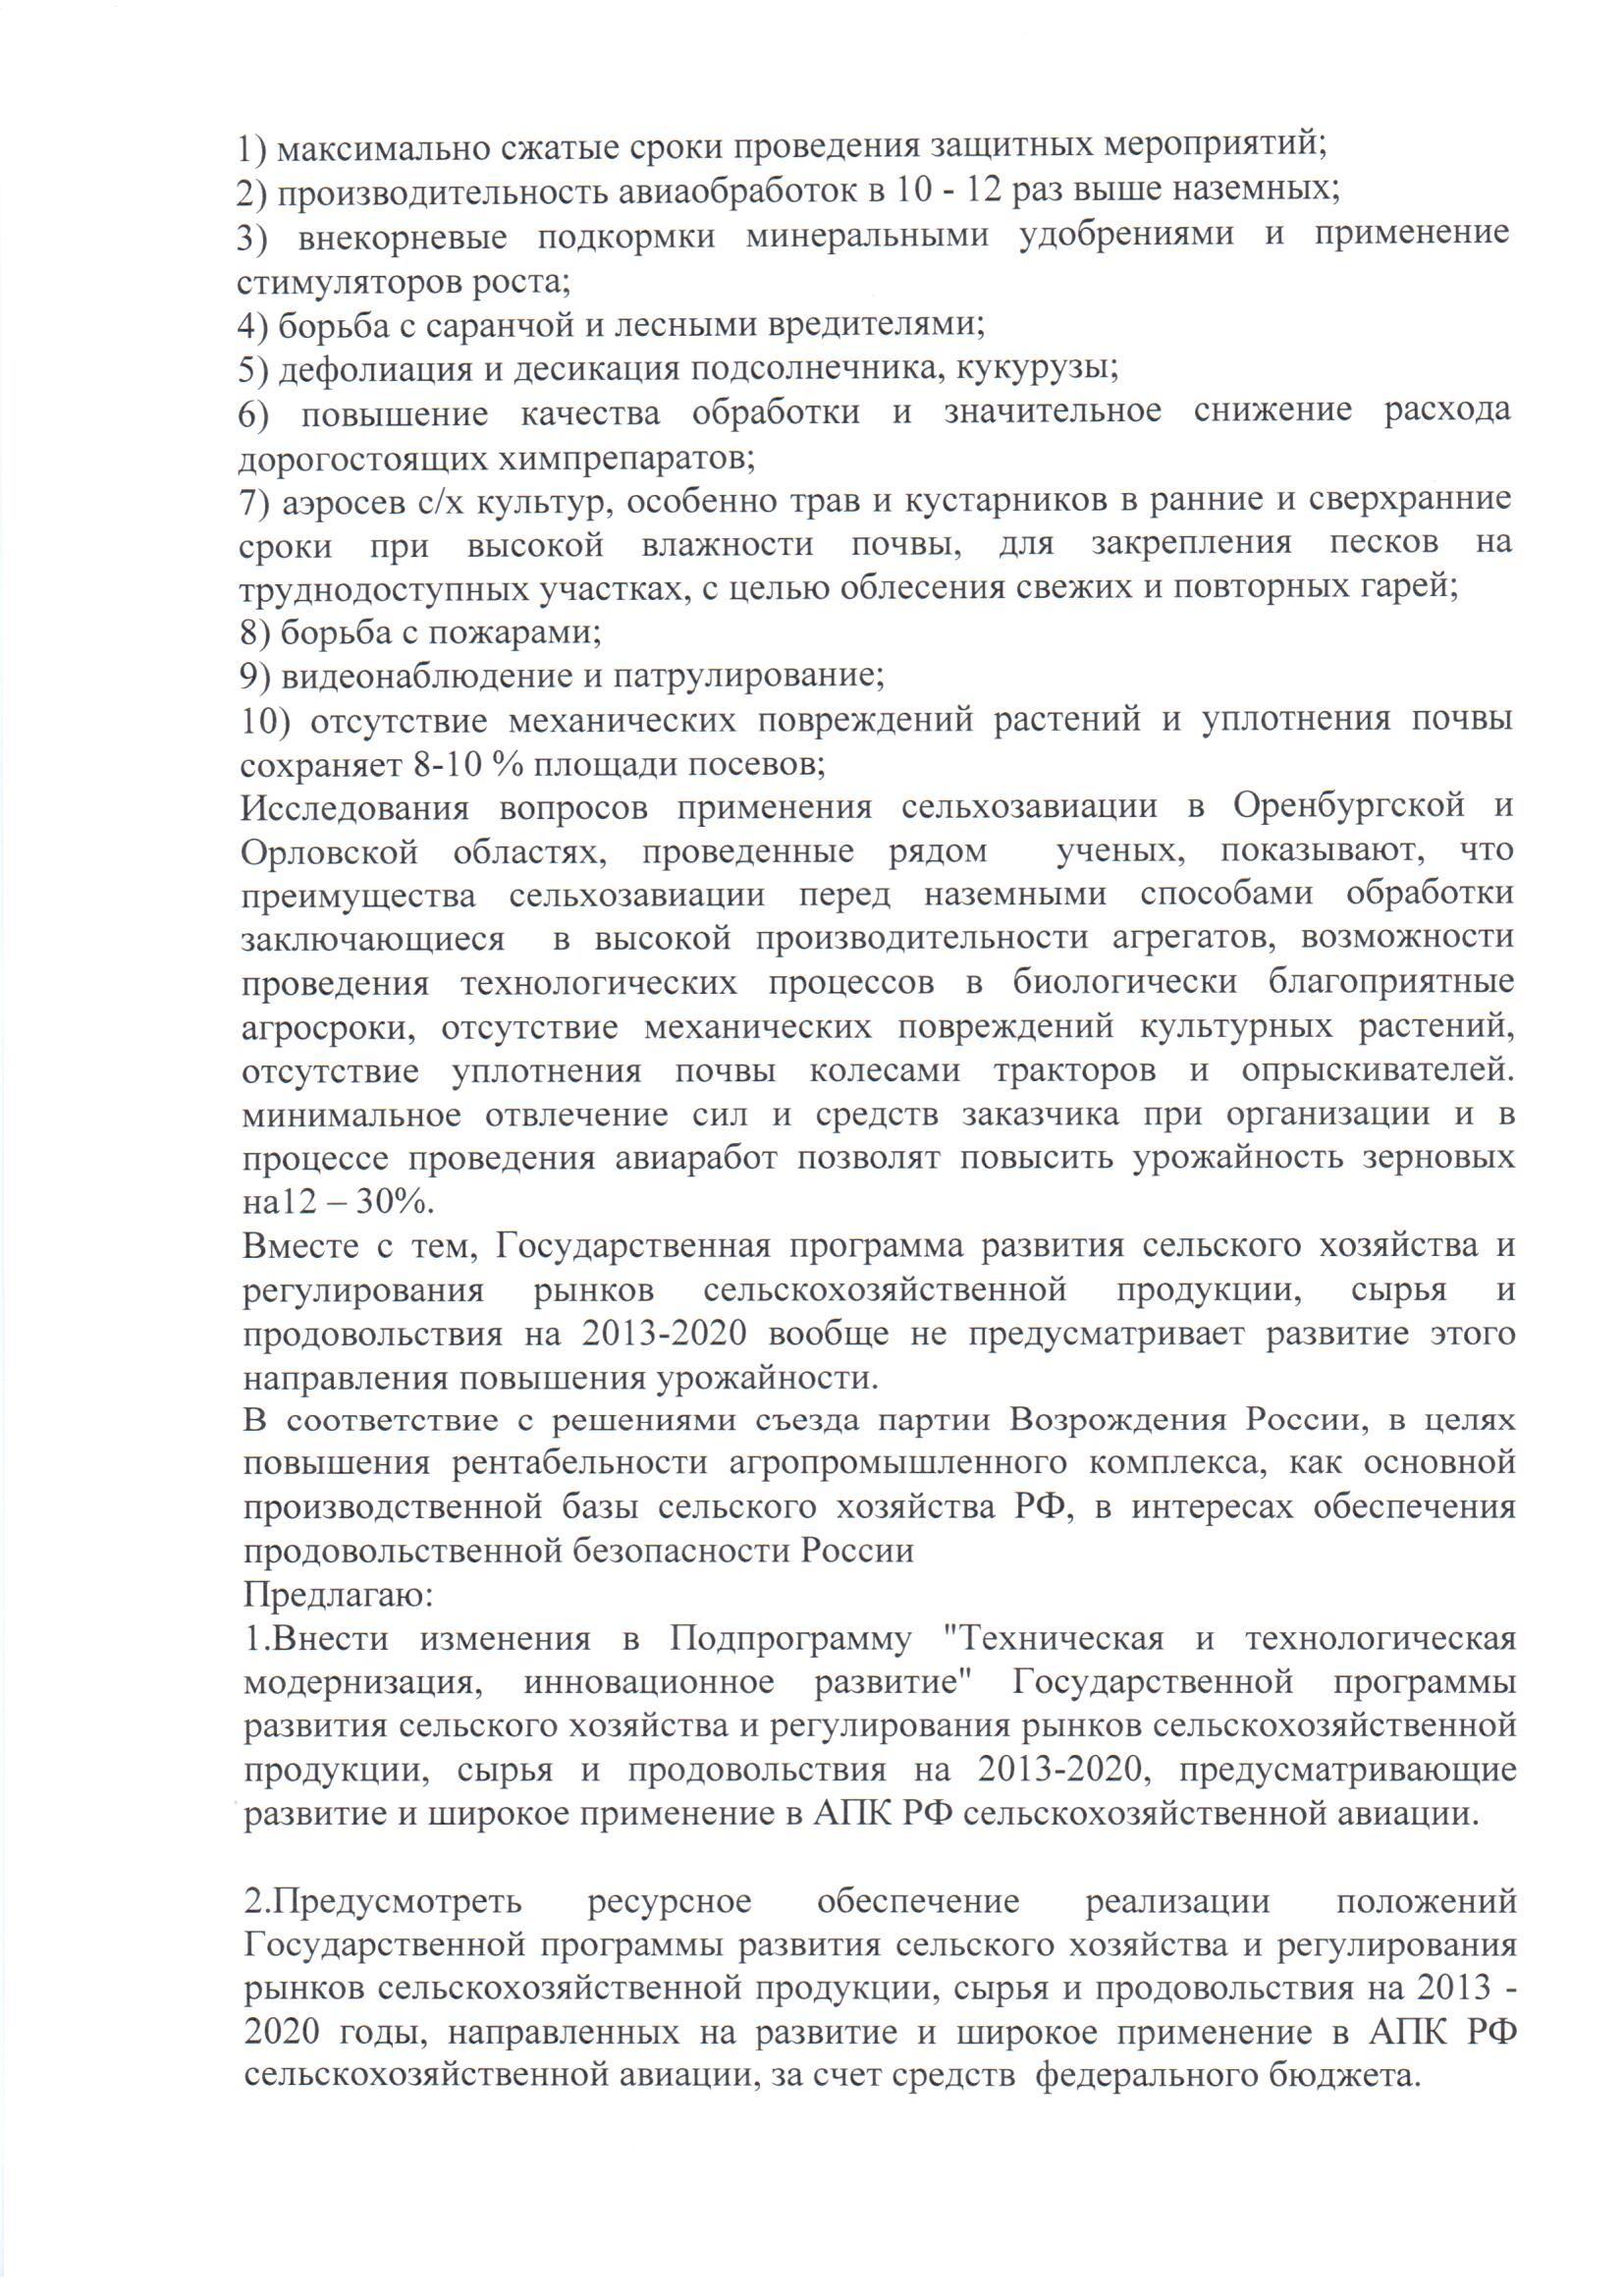 исх 129 ЦС от 12.12.14_Page_2